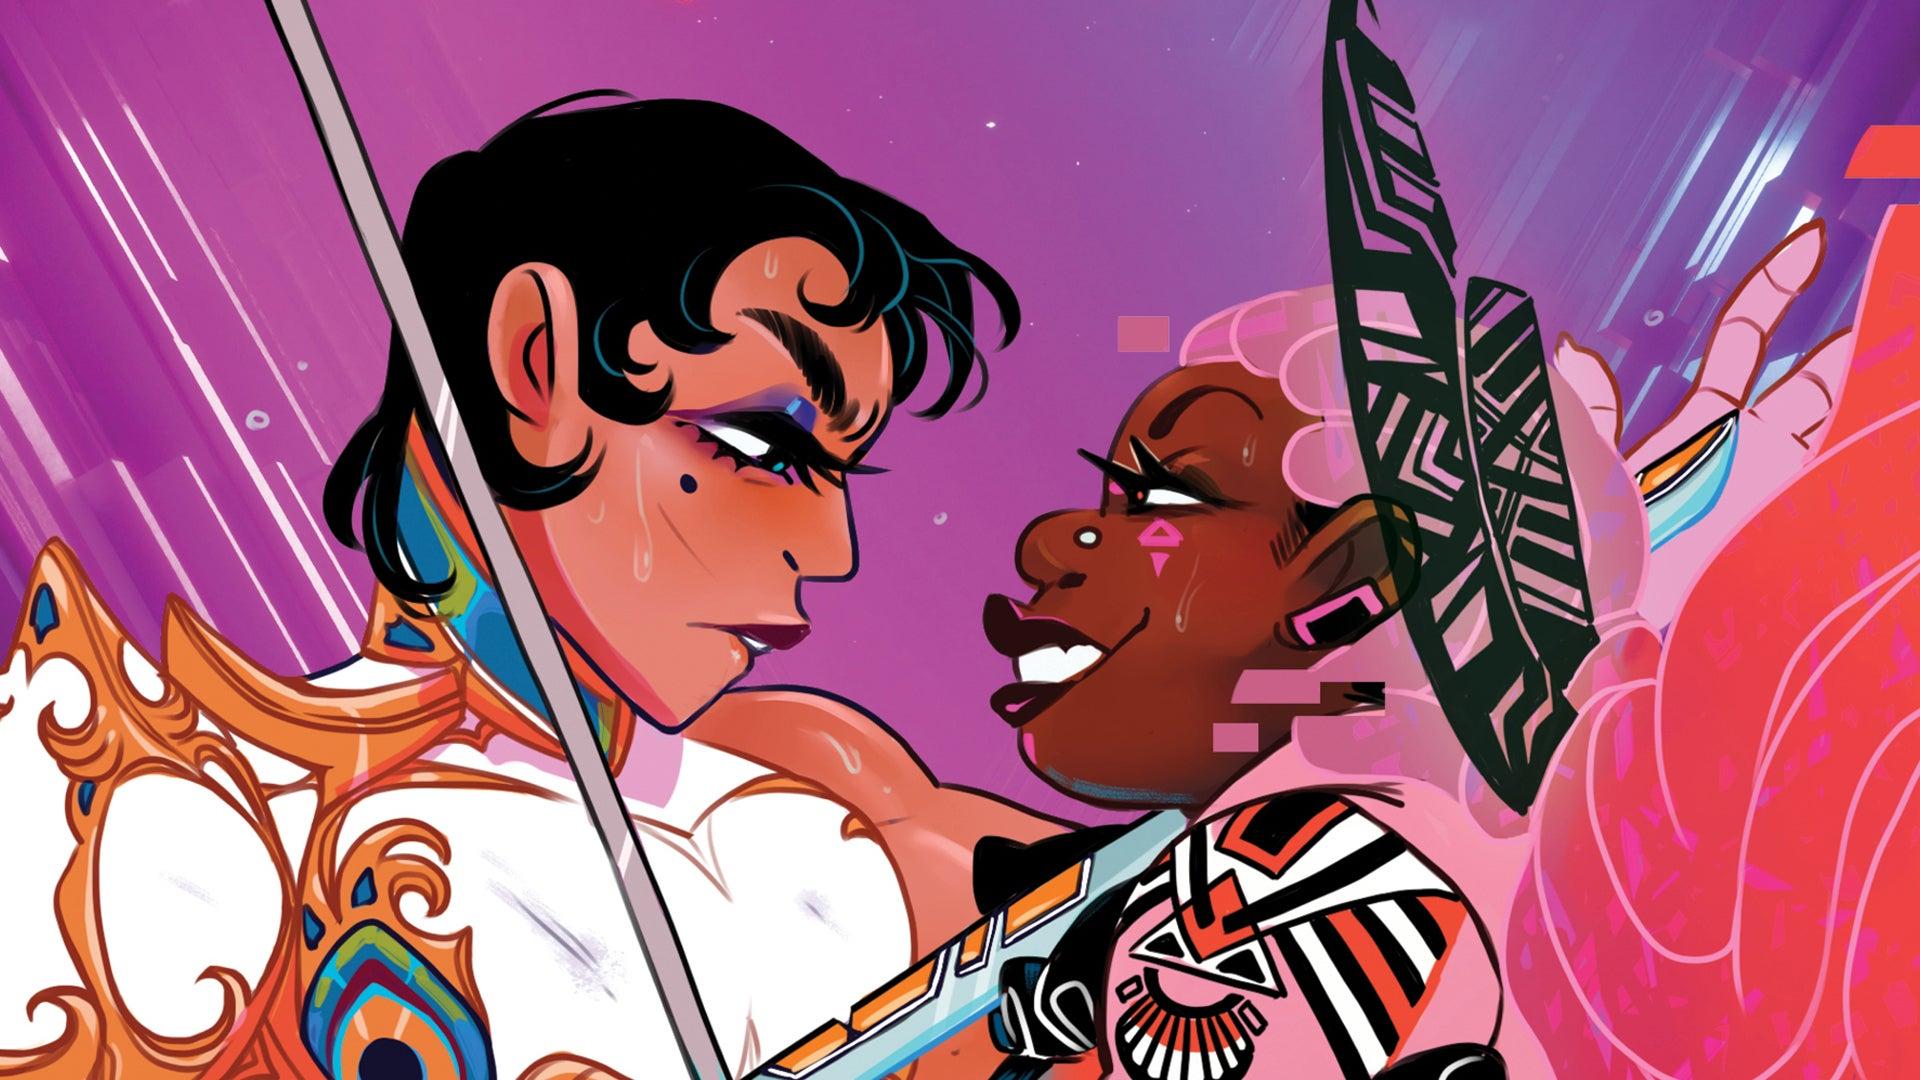 Thirsty Sword Lesbians RPG artwork